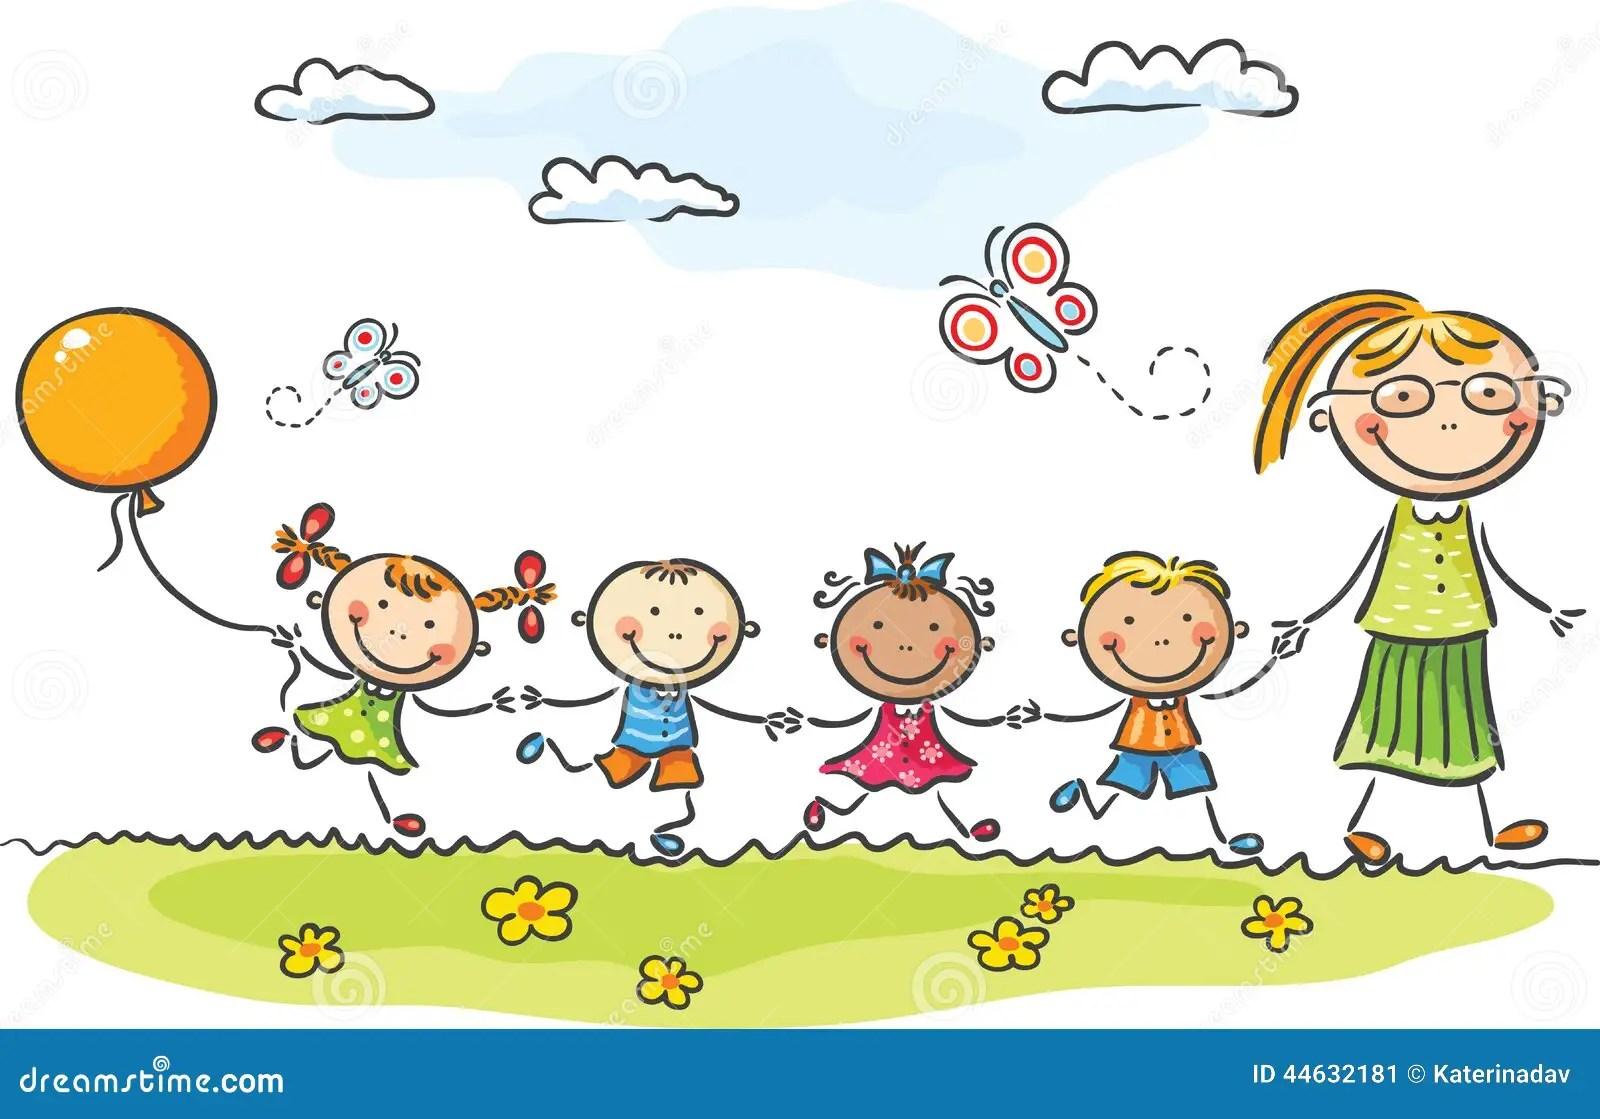 hight resolution of kindergarten stock illustrations 66 091 kindergarten stock illustrations vectors clipart dreamstime